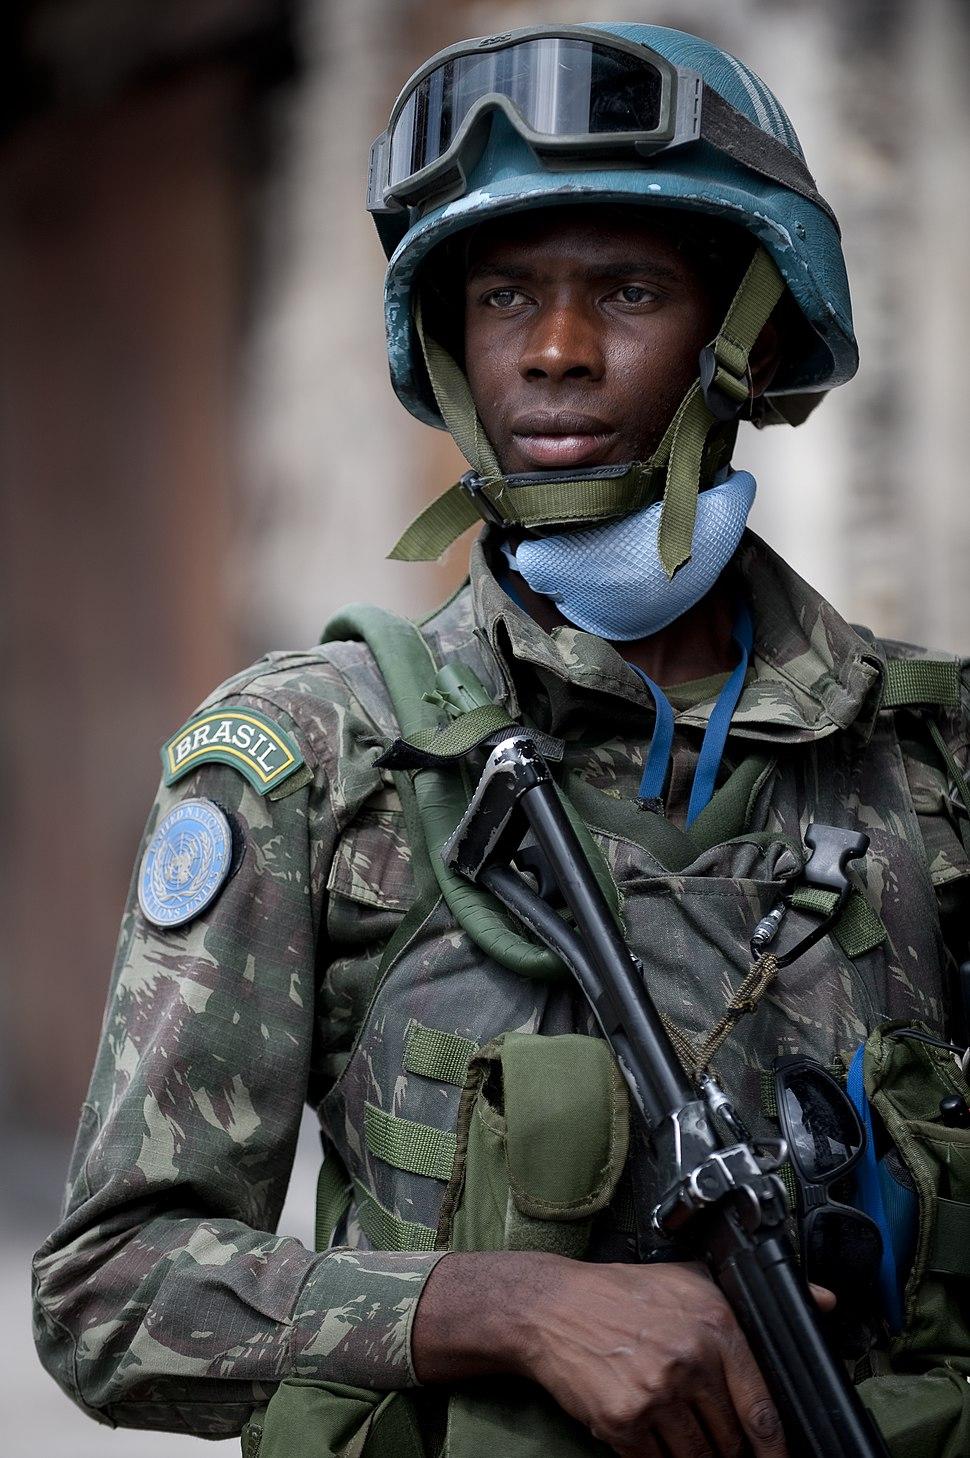 Brazilian soldier in Port-au-Prince 2010-02-26